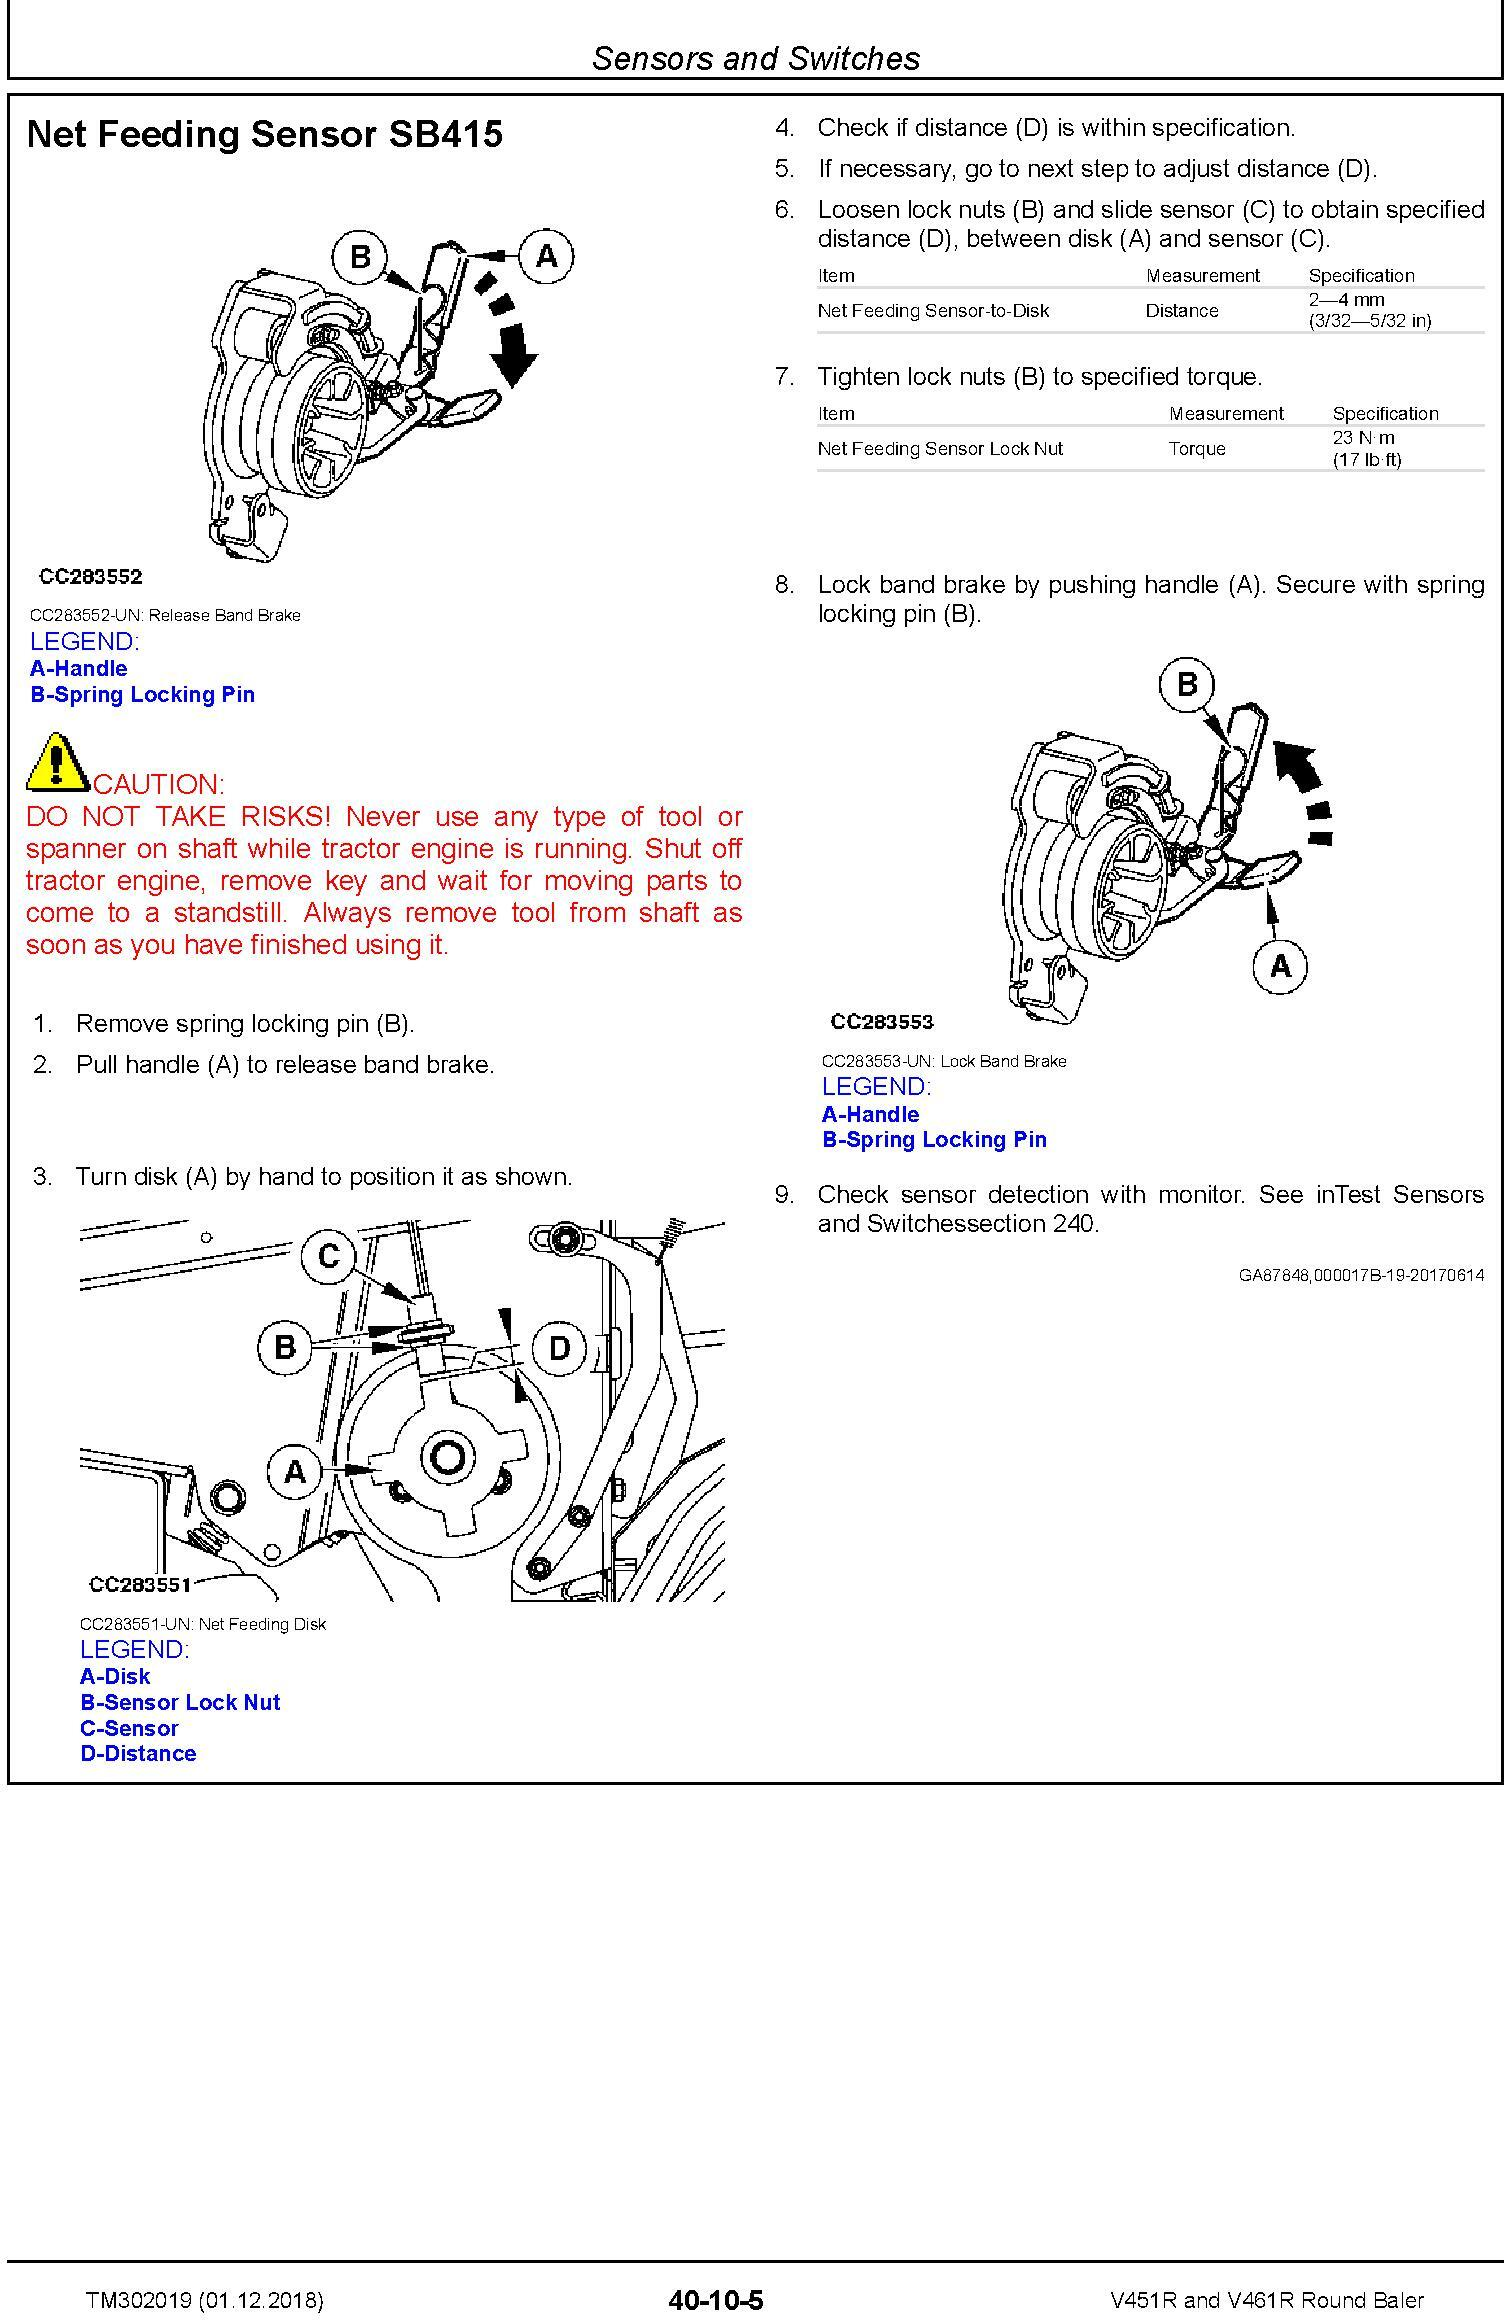 John Deere V451R and V461R Round Baler Service Repair Technical Manual (TM302019) - 2